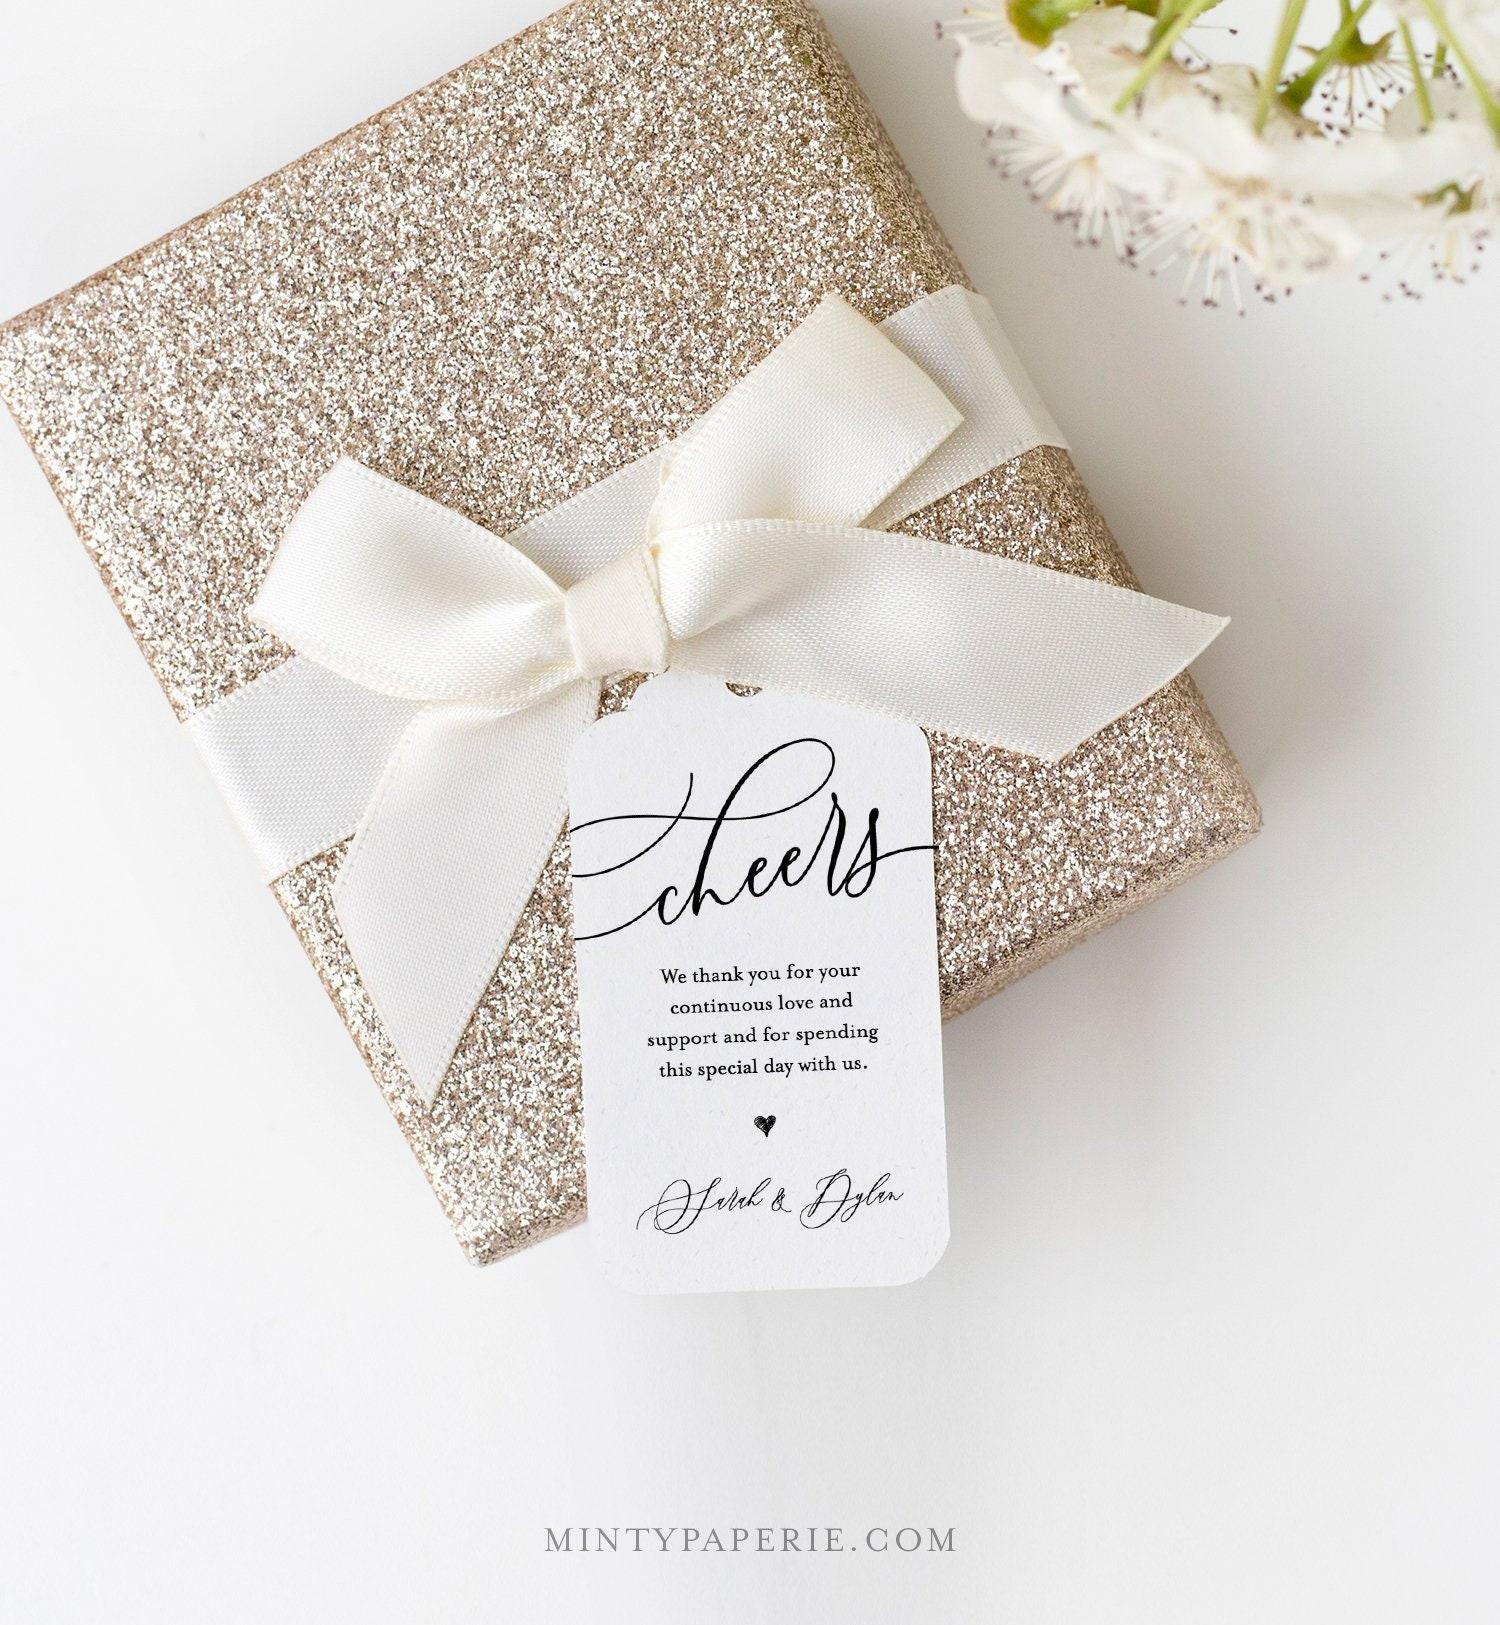 Cheers Tag Template, Printable Wine Tag, Wedding Favor Tag